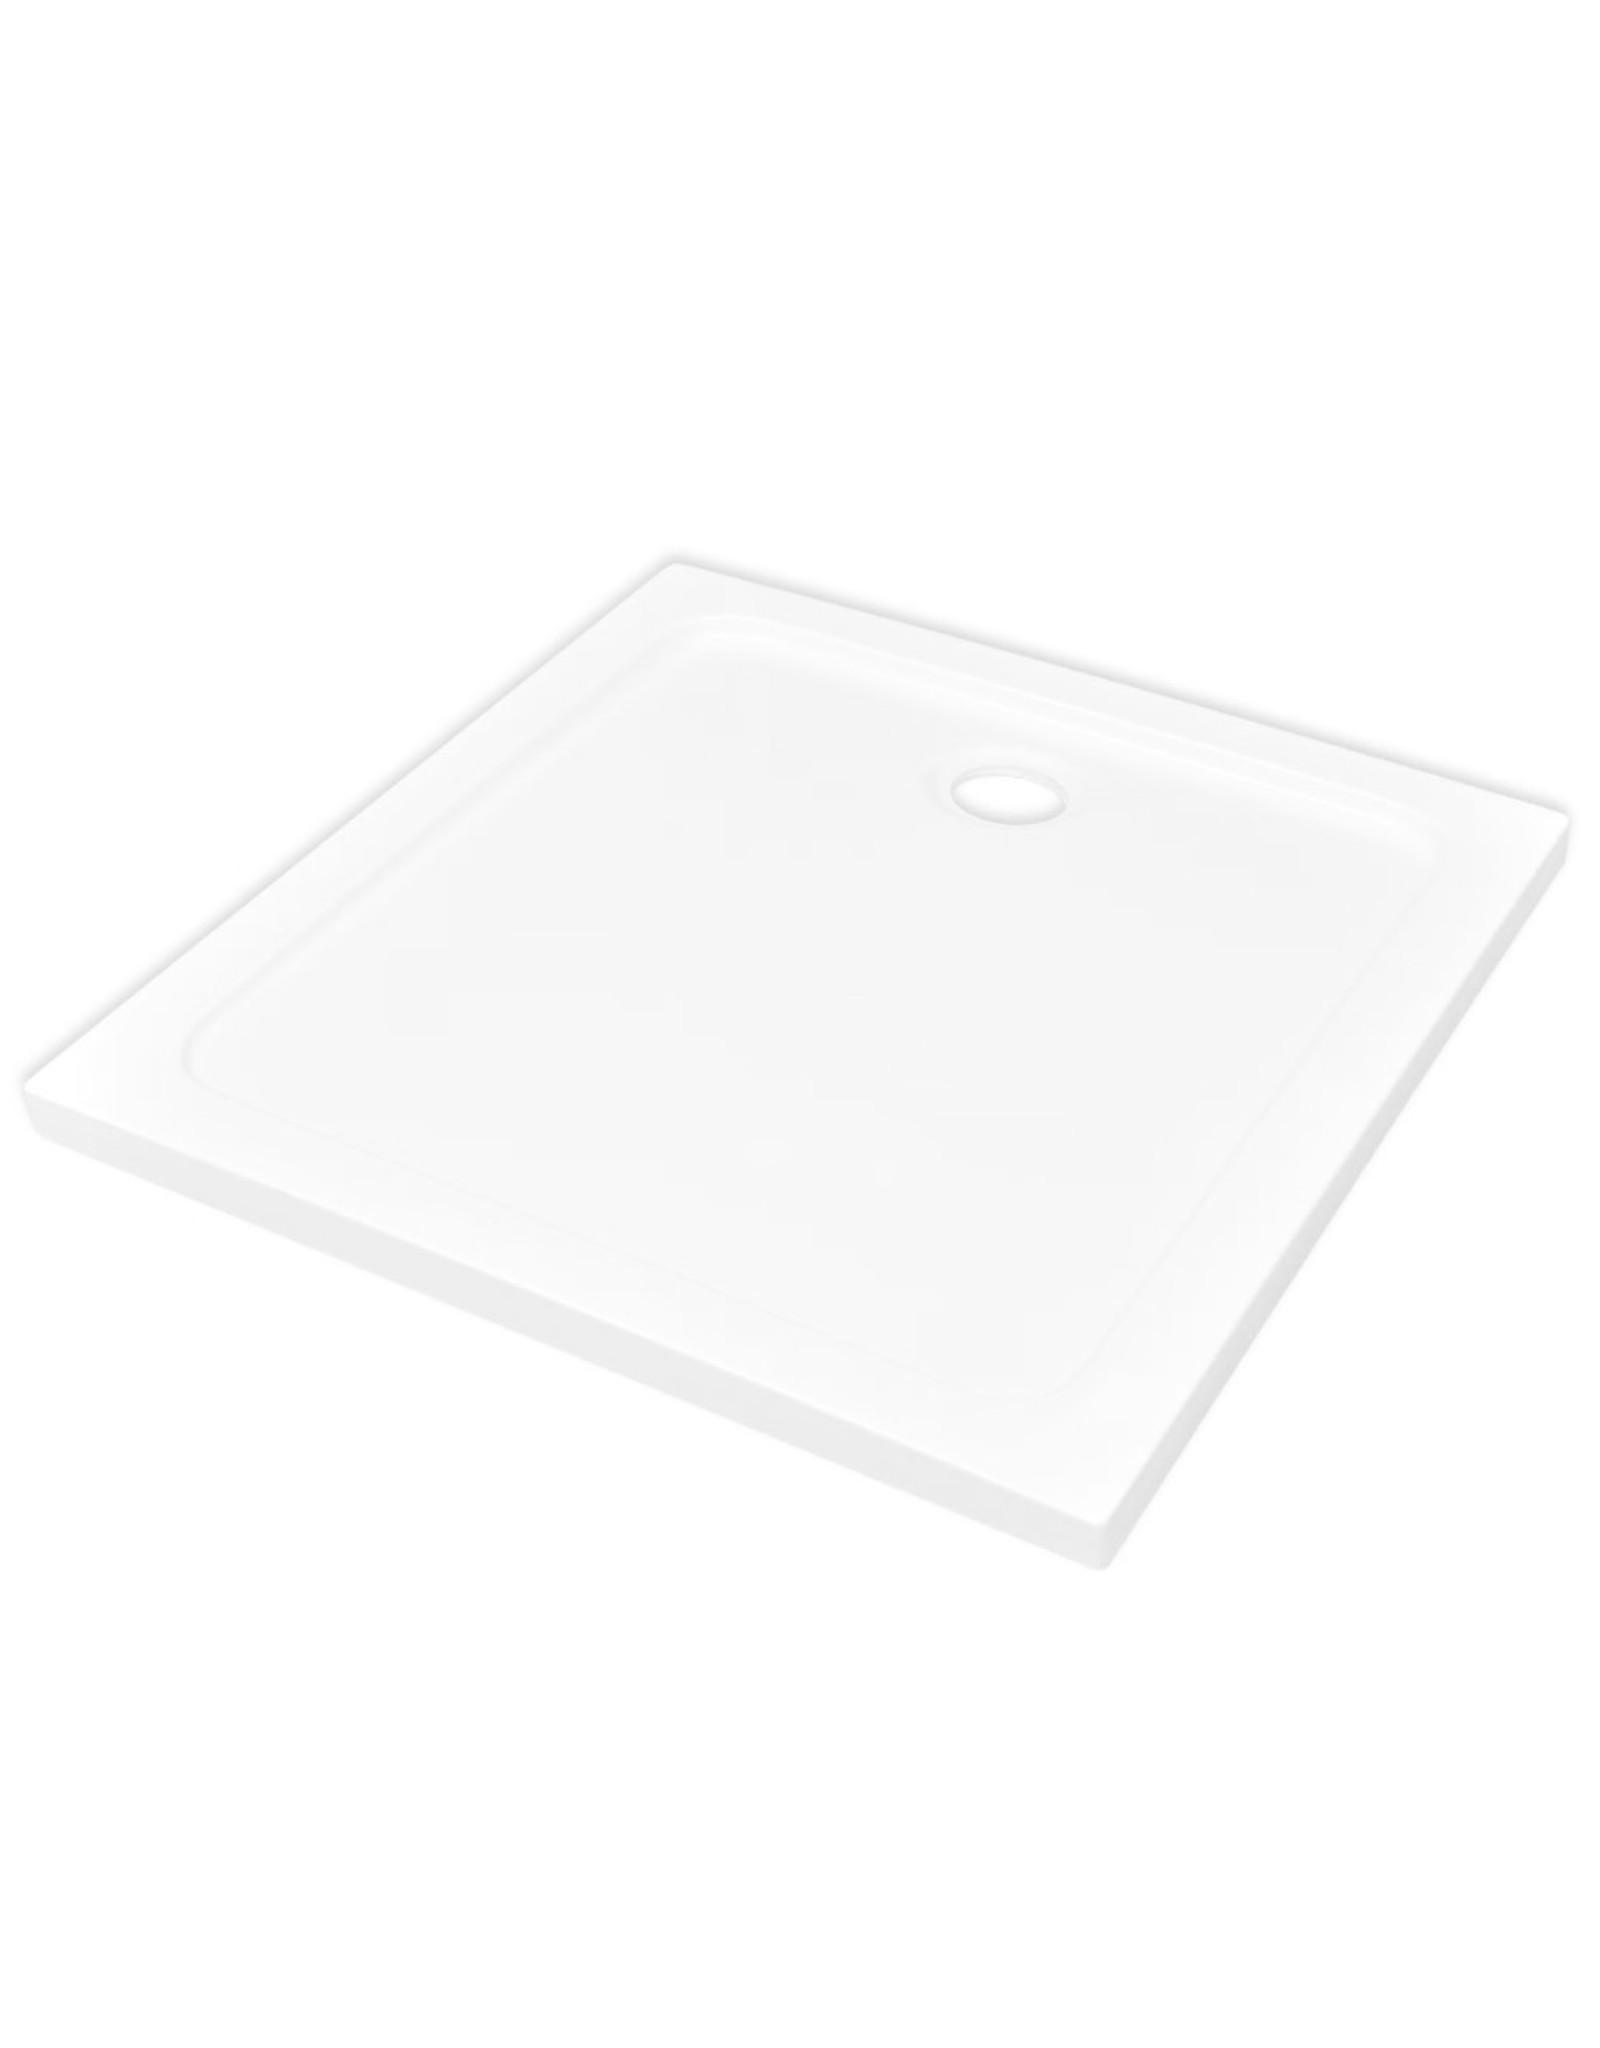 Douchebak vierkant 80x80 cm ABS wit